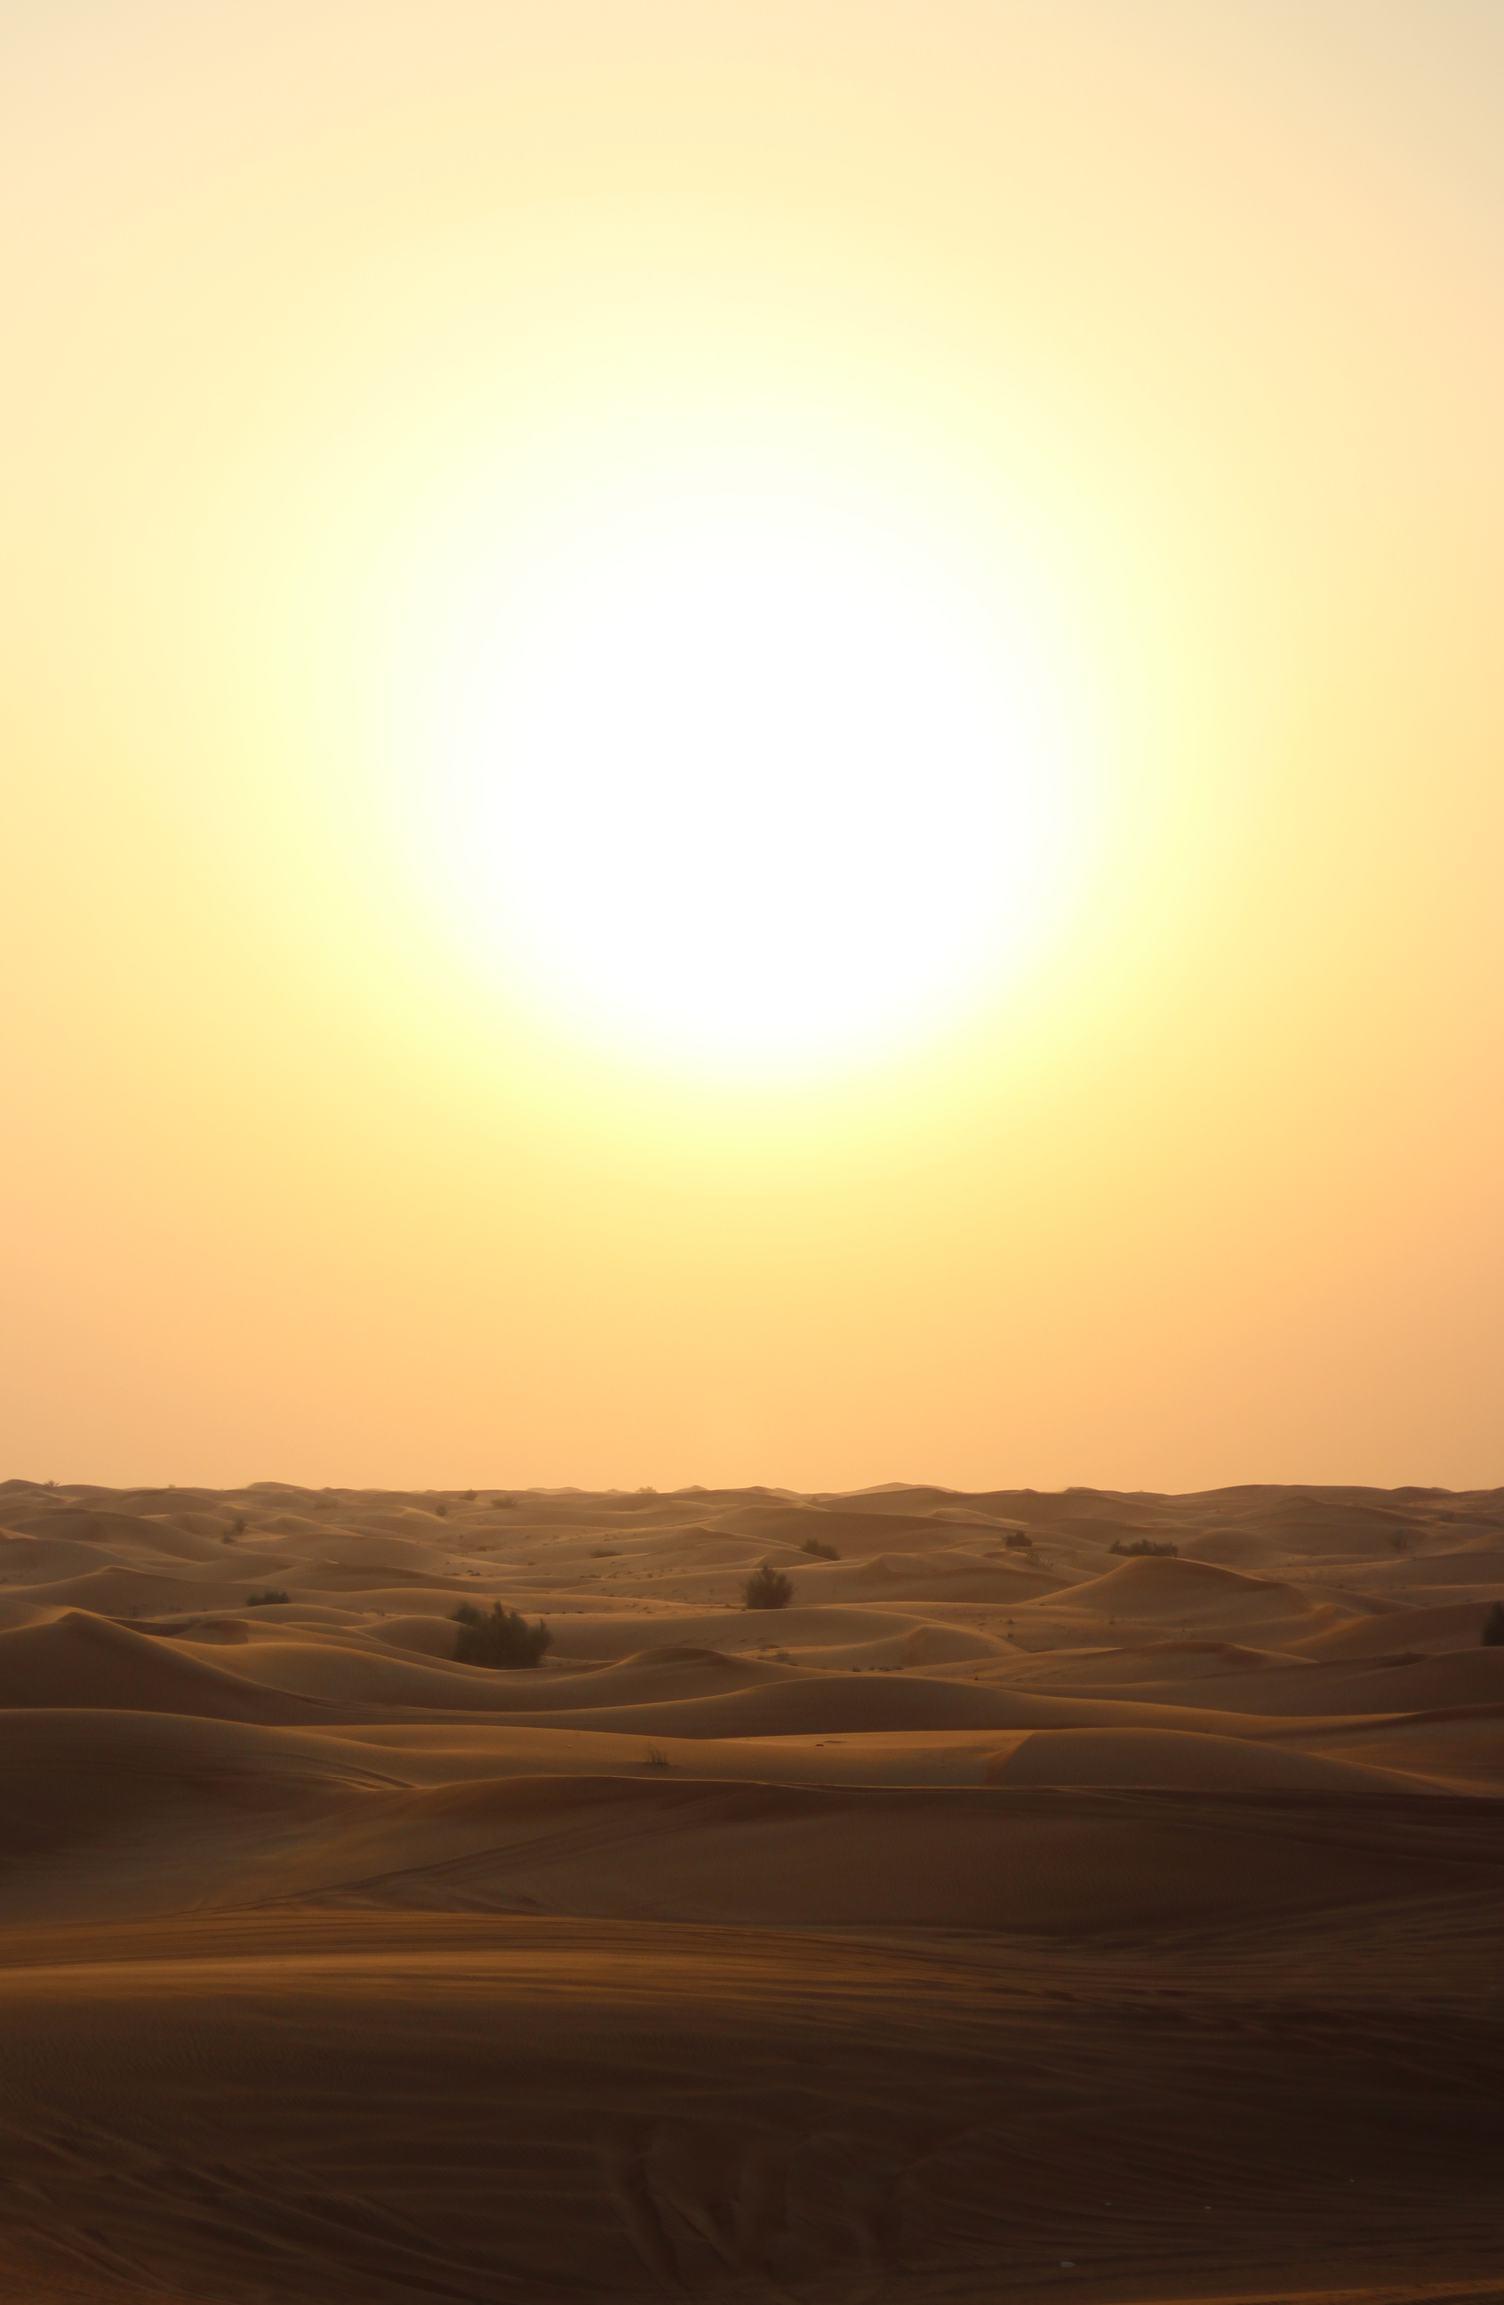 Desert Evening Glowing by the Big Sun